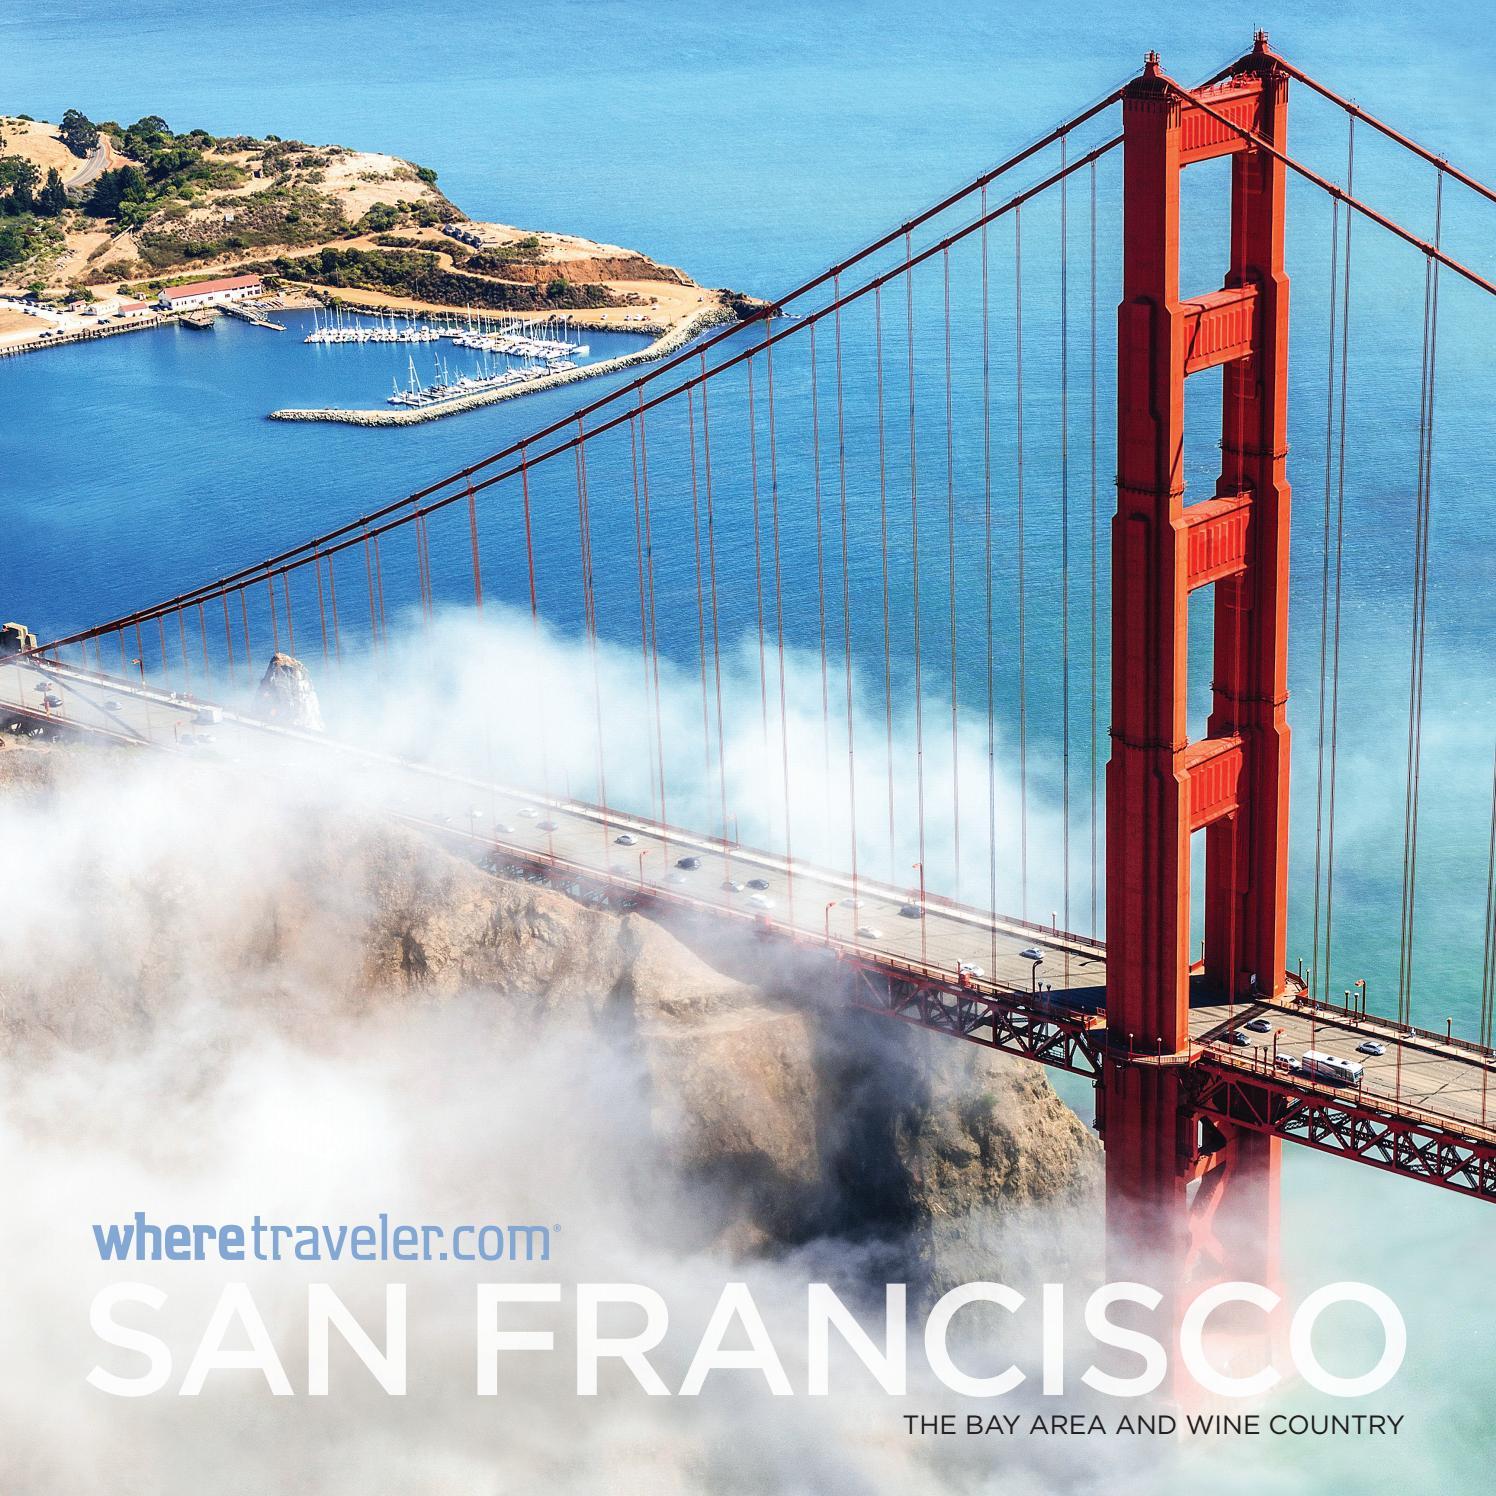 8476c6b42 San Francisco Where GuestBook 2016-2017 by Morris Media Network - issuu